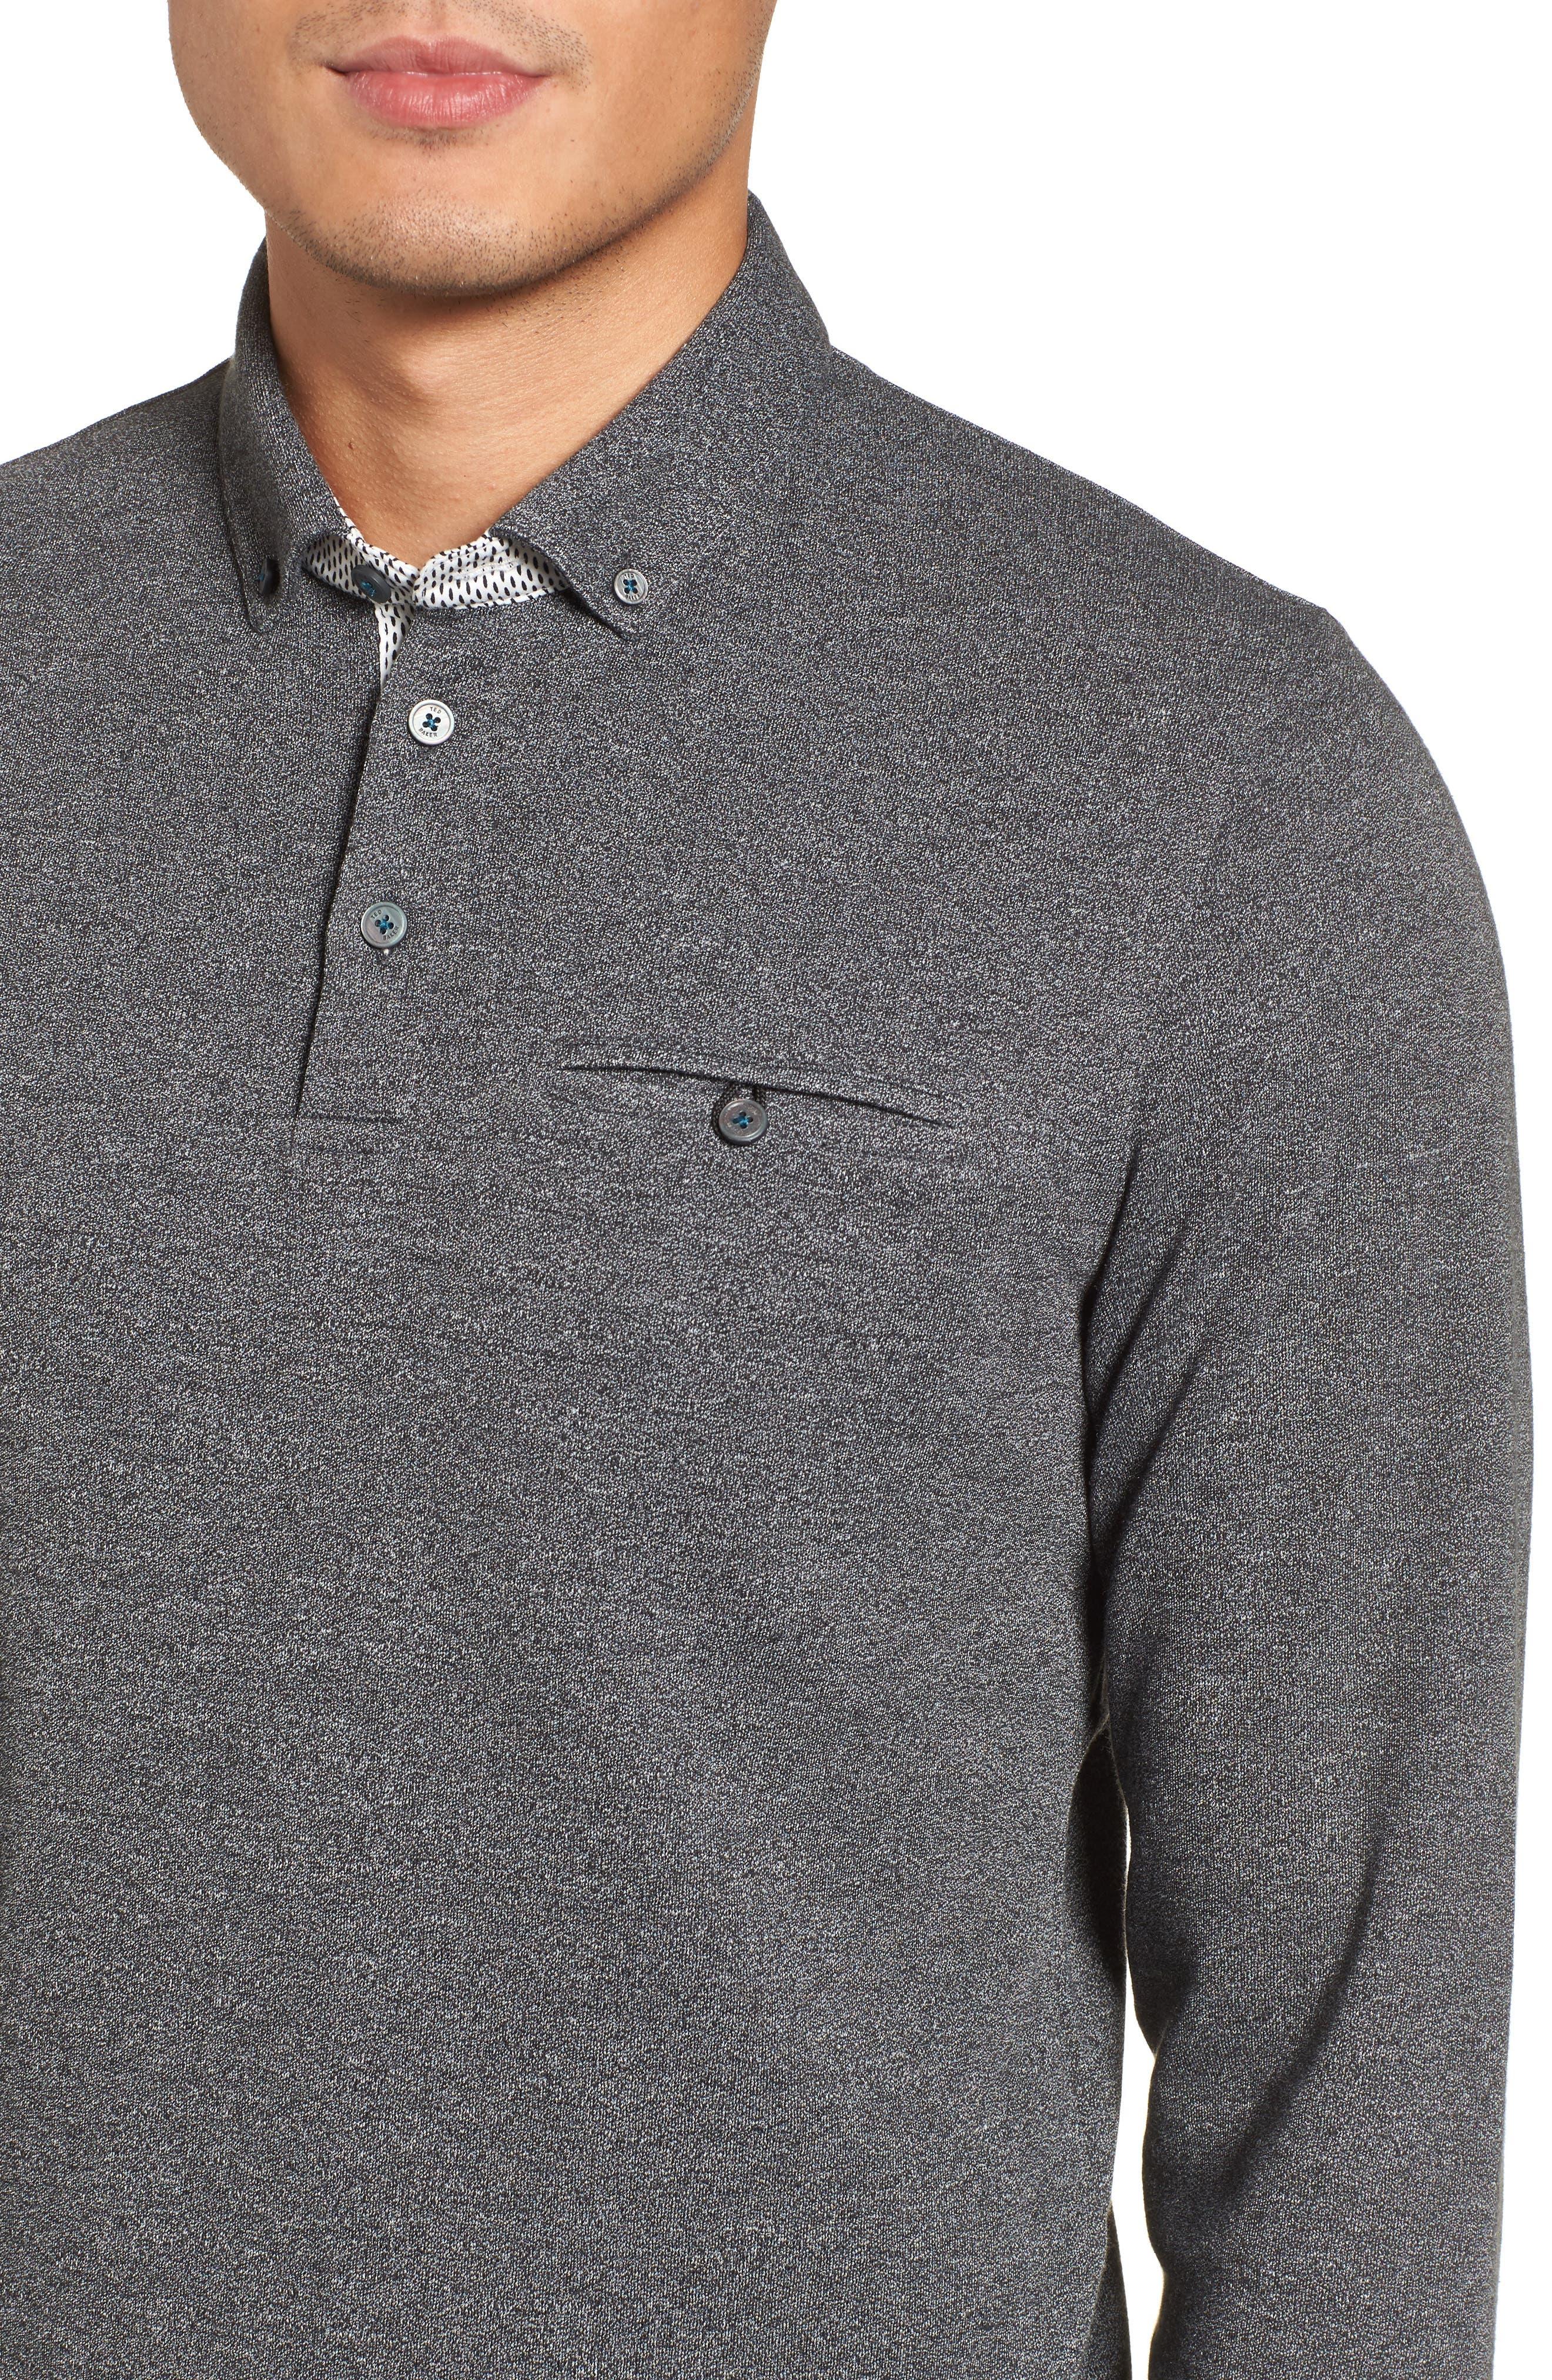 Yamway Modern Slim Fit Long Sleeve Polo,                             Alternate thumbnail 4, color,                             Black